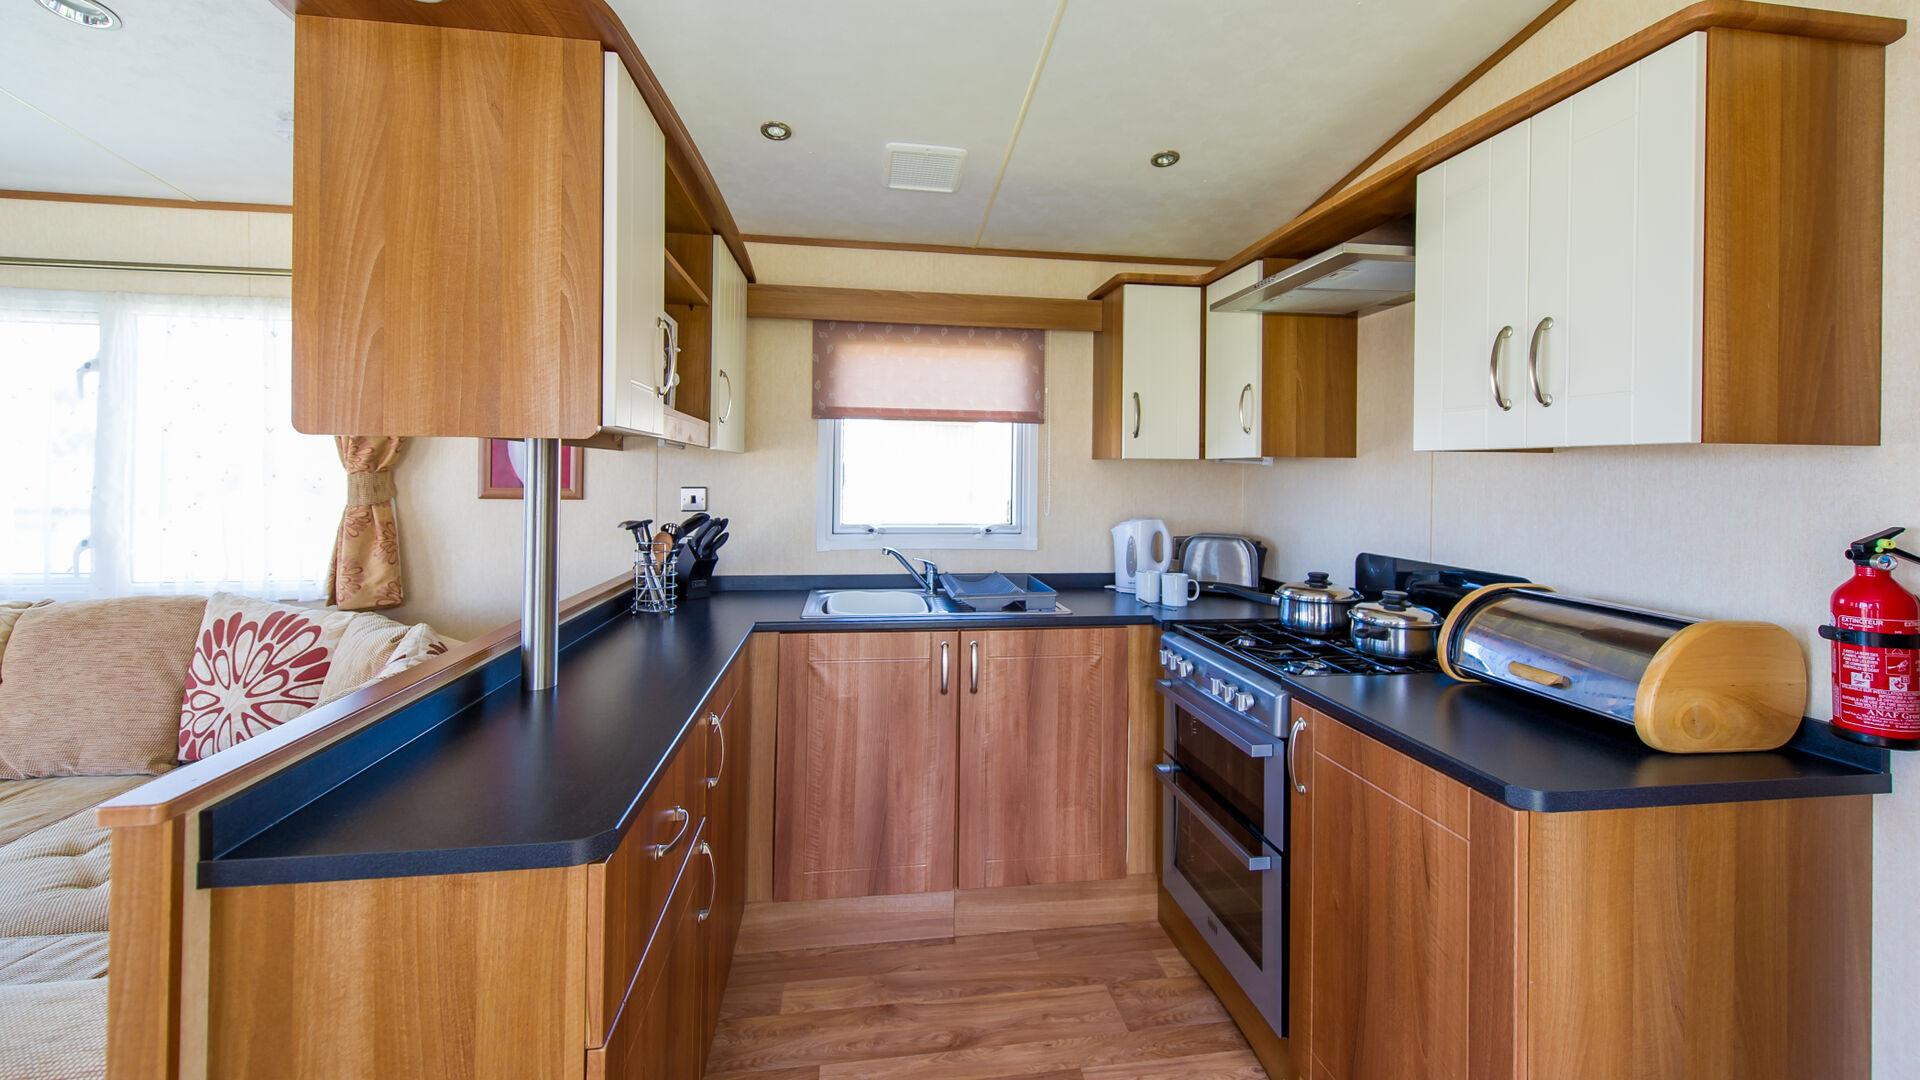 swan 32 static caravan with 2 bedrooms for hire at westward ho